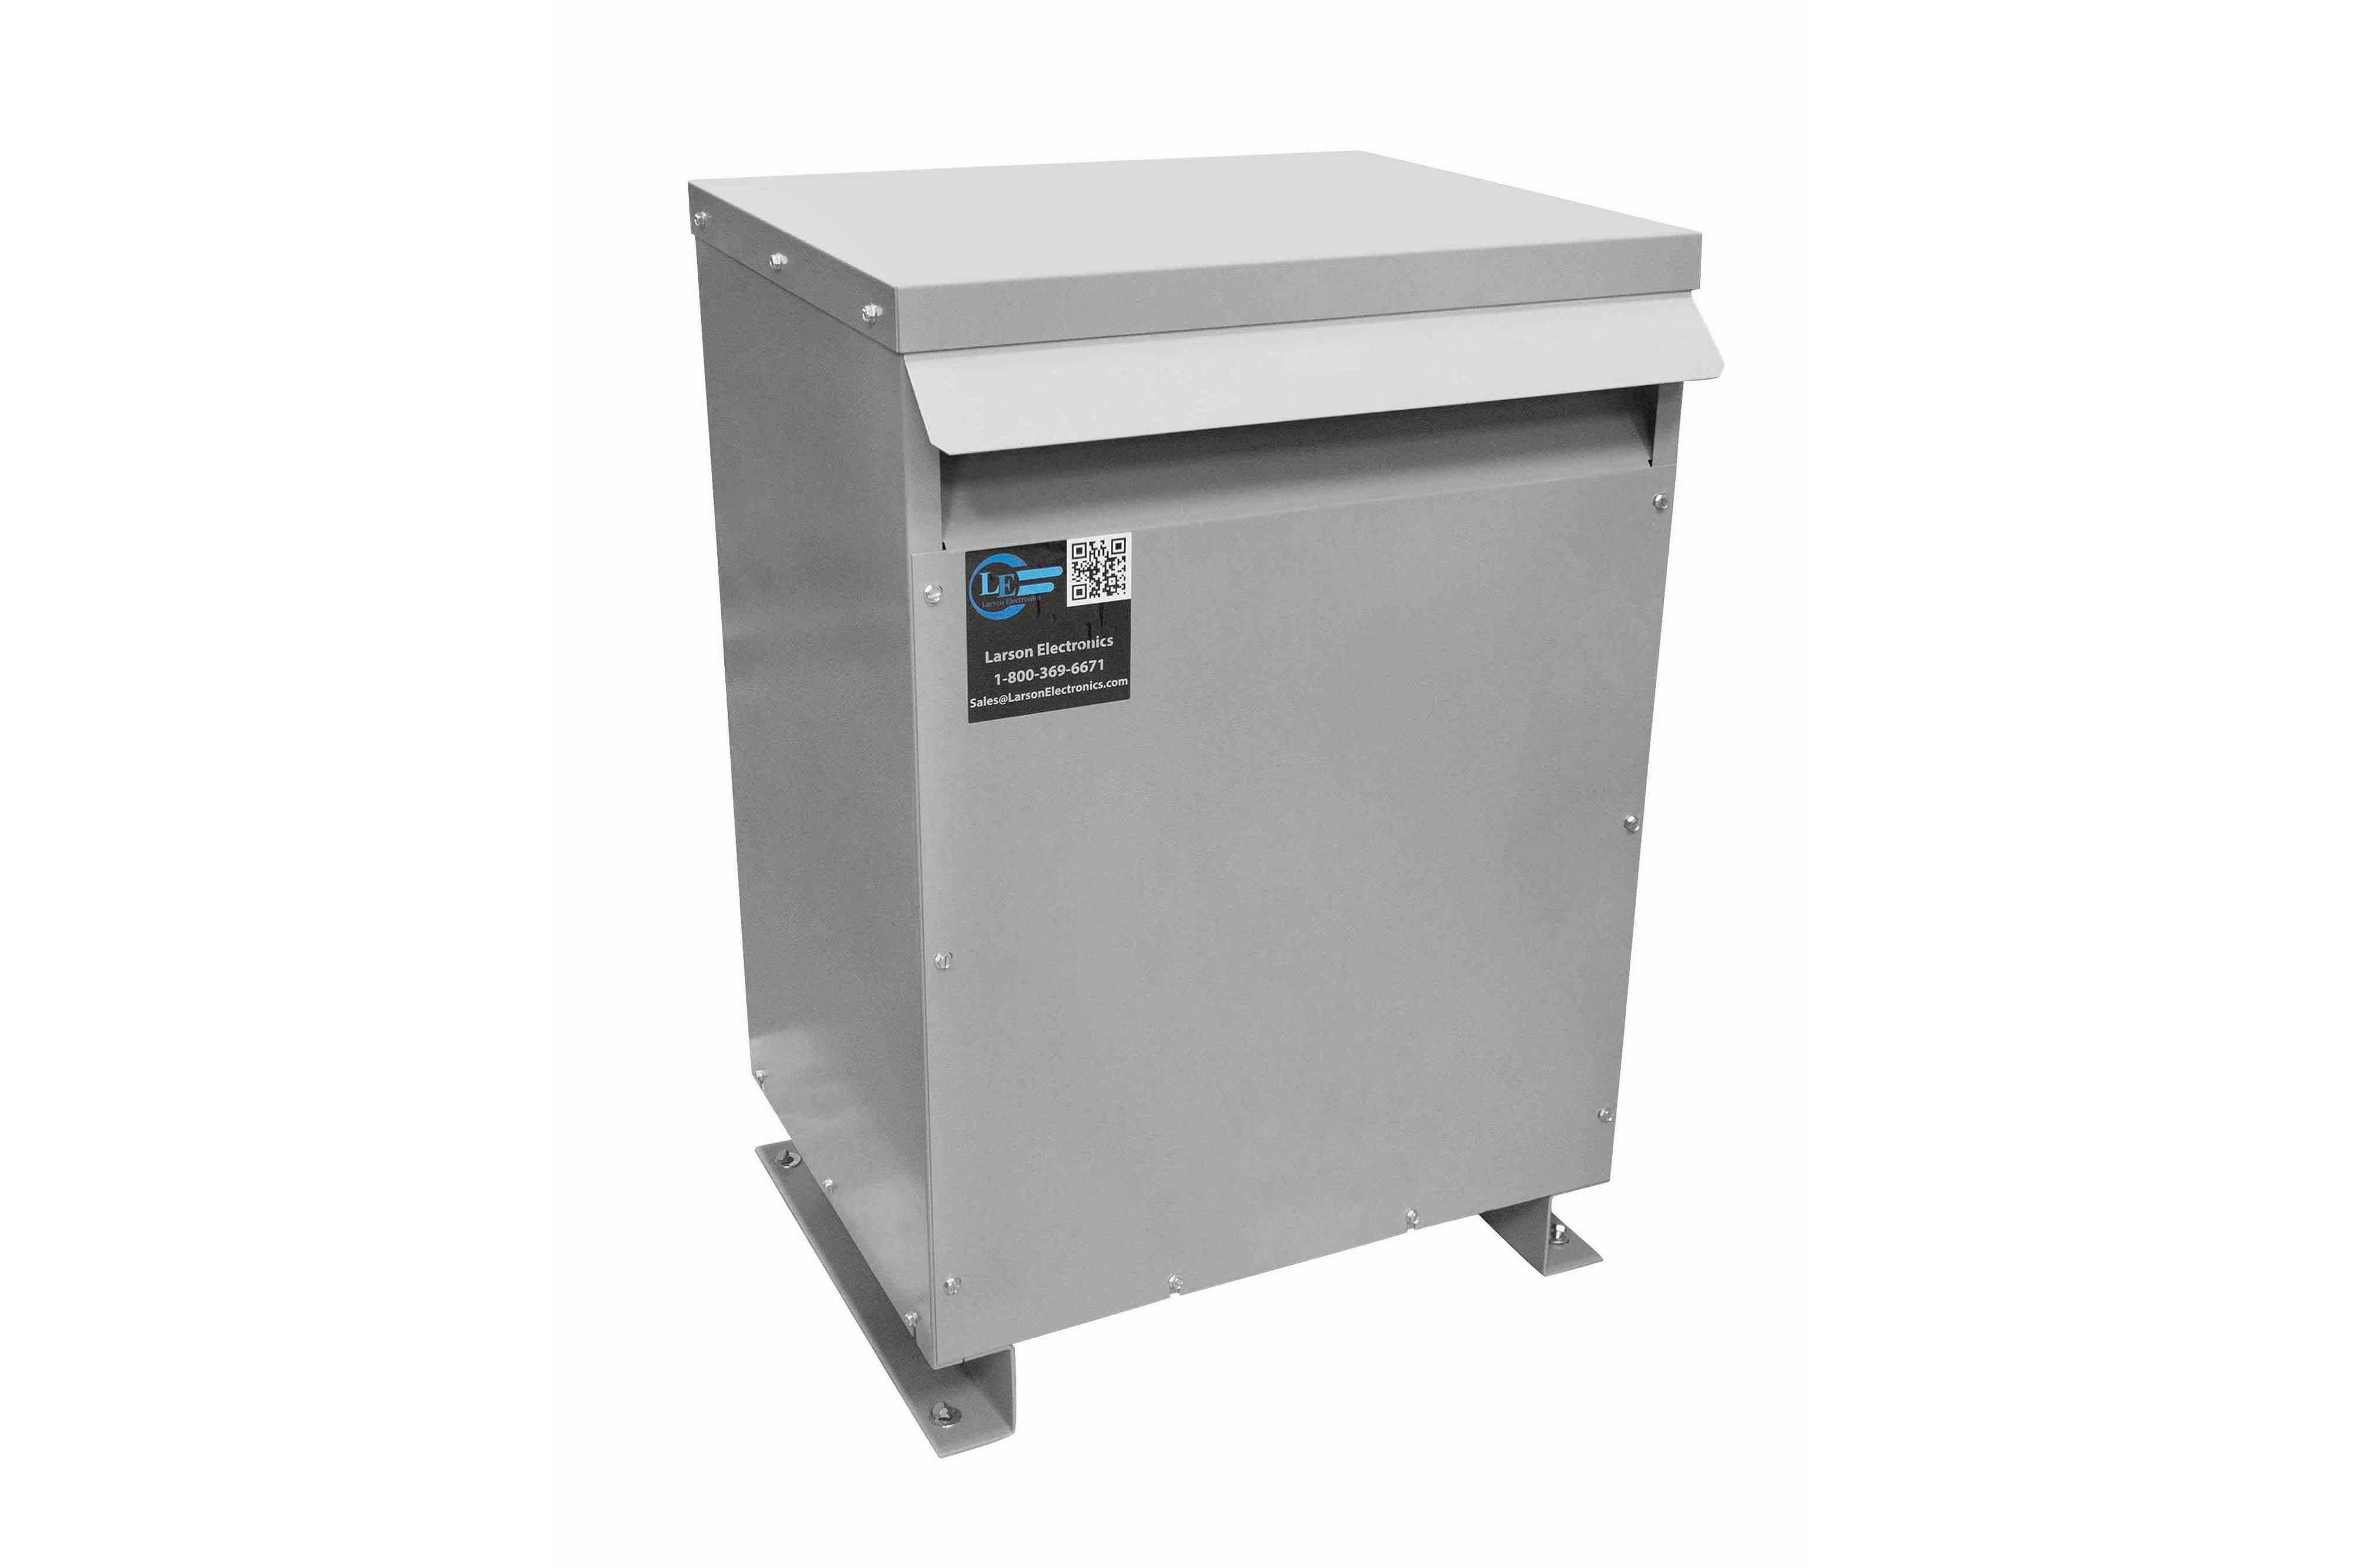 137.5 kVA 3PH Isolation Transformer, 208V Wye Primary, 600Y/347 Wye-N Secondary, N3R, Ventilated, 60 Hz